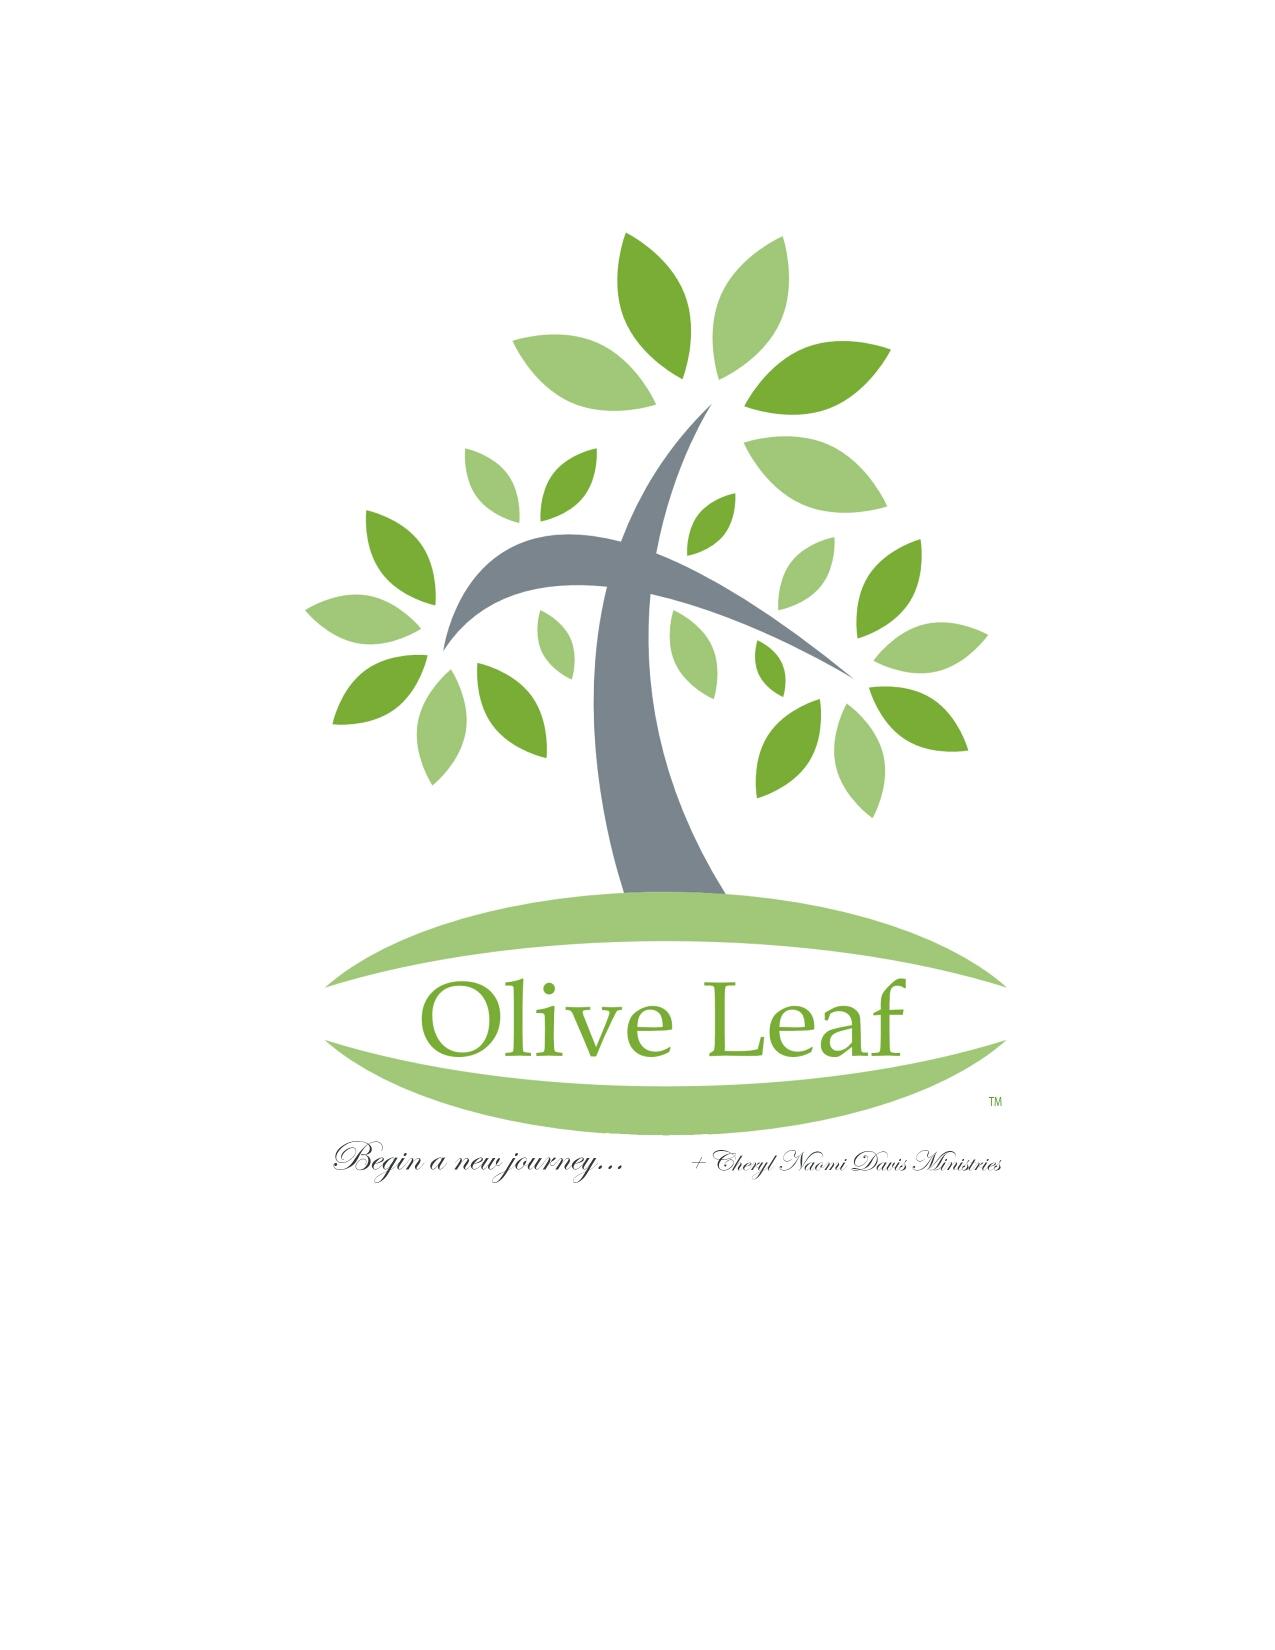 Olive Leaf Beginnings